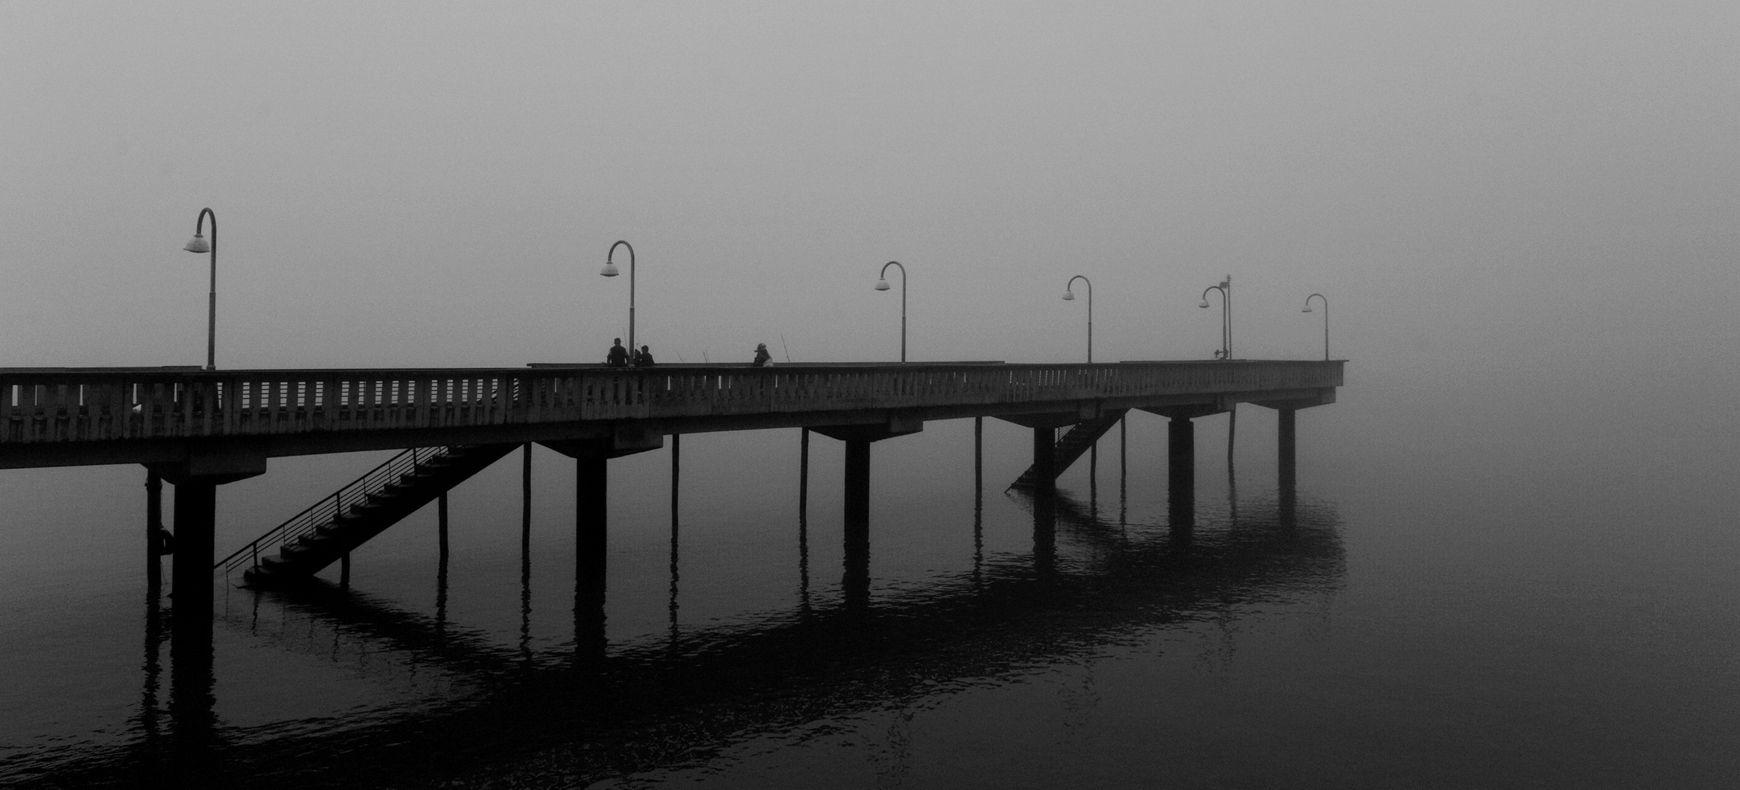 El reino de la niebla